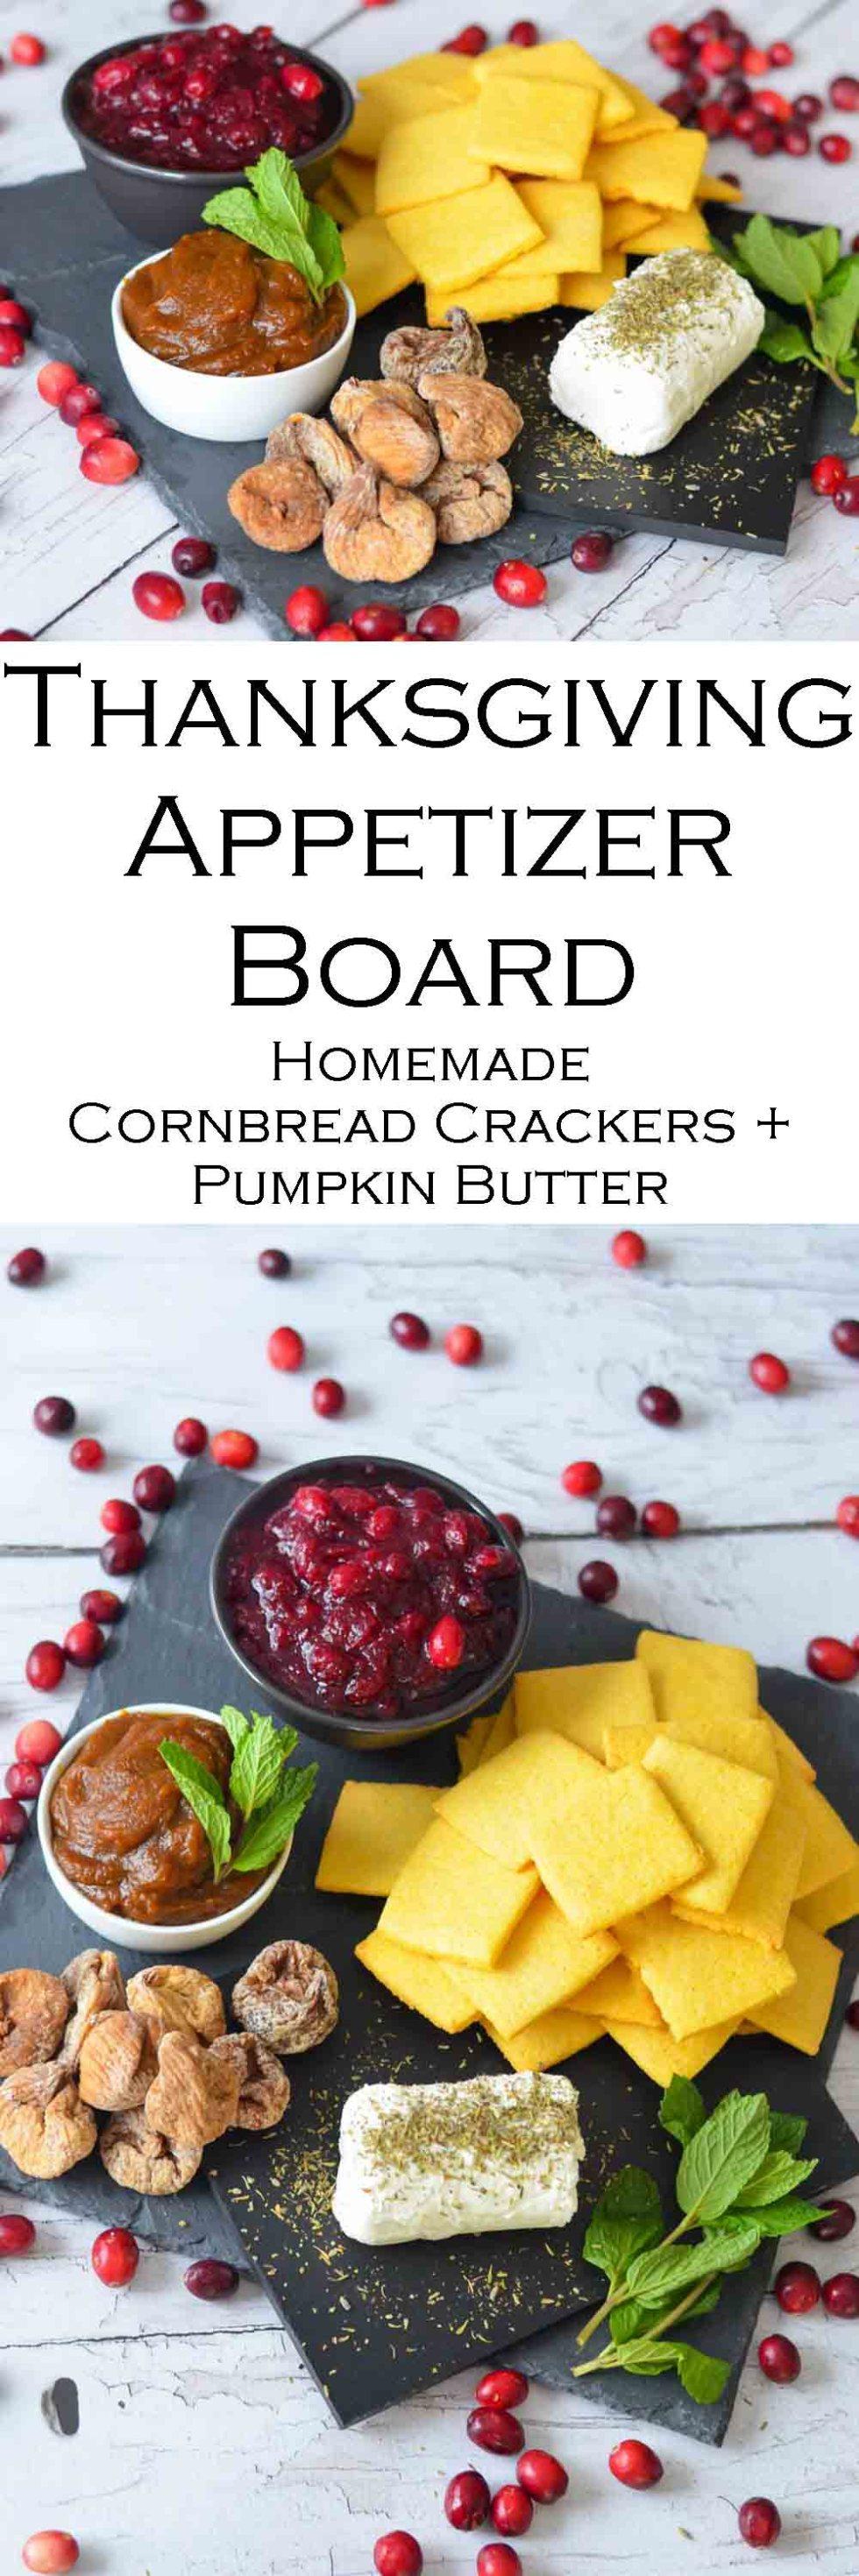 Easy Cornbread Crackers Recipe#LMrecipes #pumpkin #thanksgiving #christmas #holidayparty #holidaypartyfood #traderjoes #pumpkin #appetizers #homesteading #foodblog #foodblogger